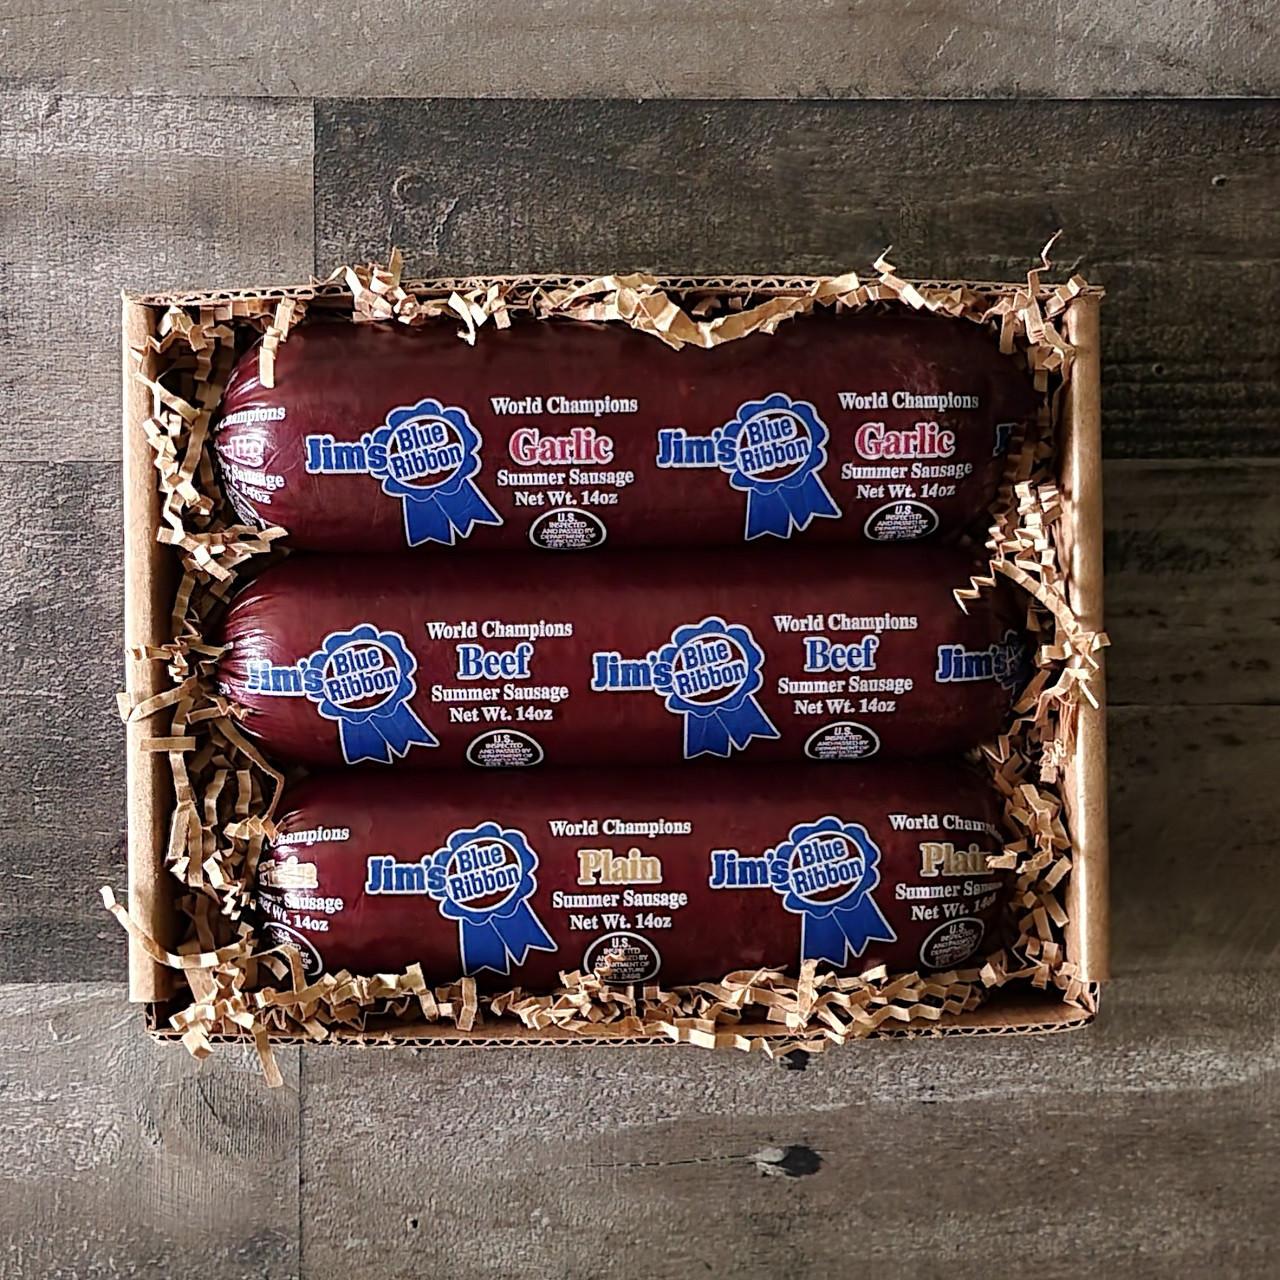 Jim's Blue Ribbon Summer Sausage Sampler Plain, Beef & Garlic all in a 14 oz size